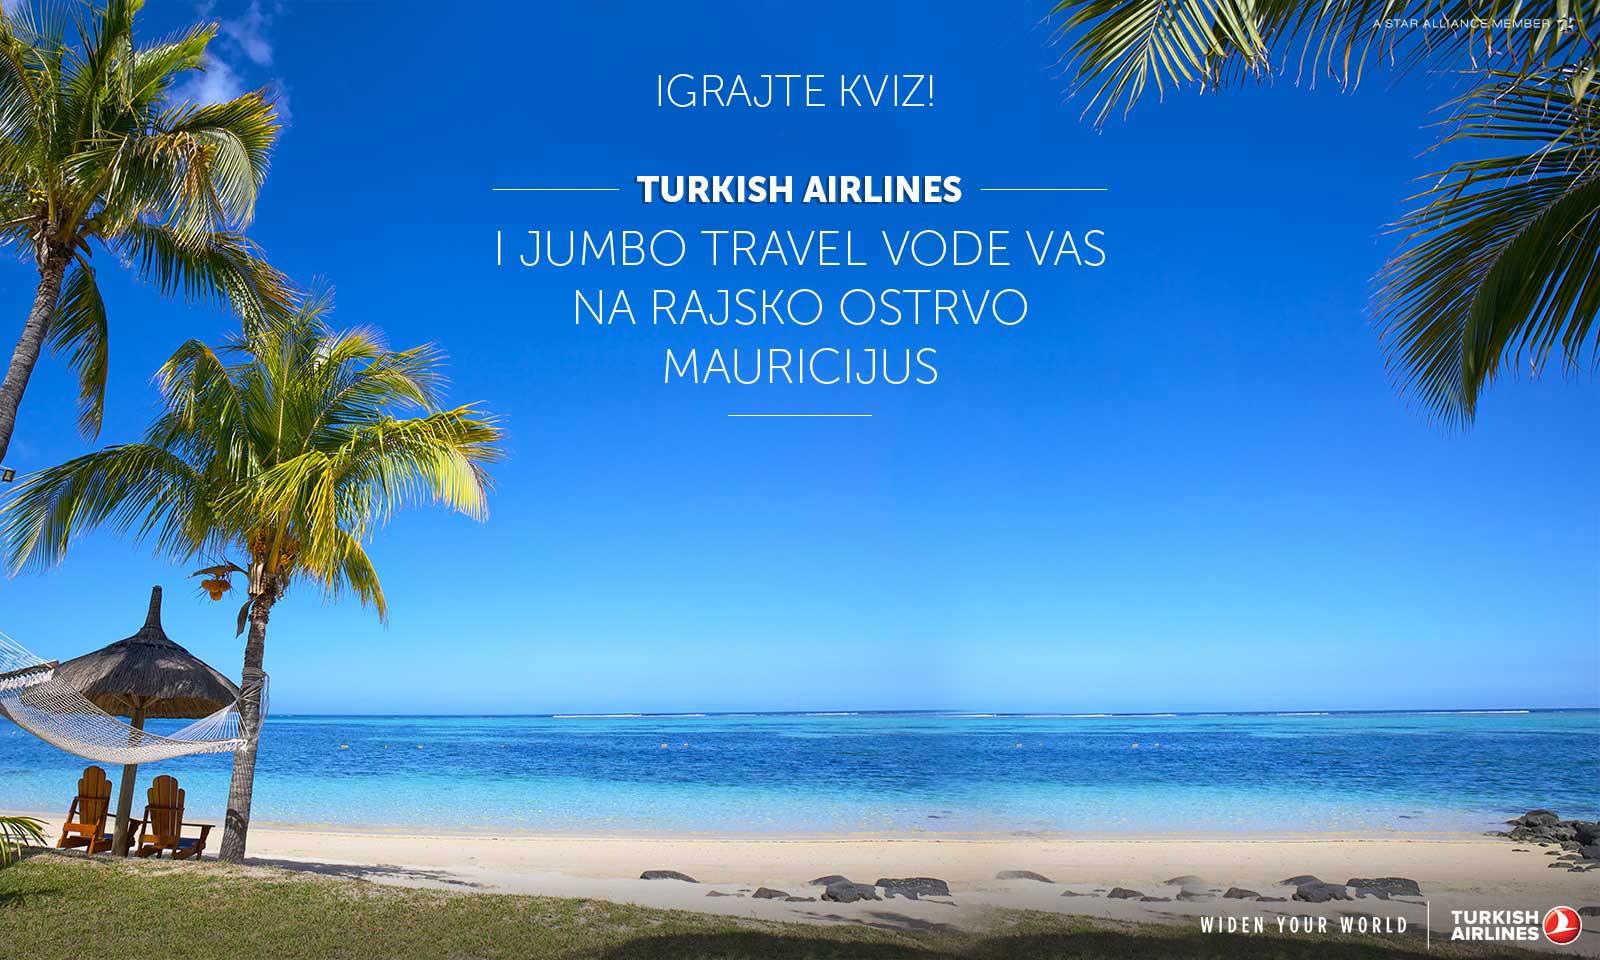 jumbo-turkish-kviz-mauricijus-1600x960